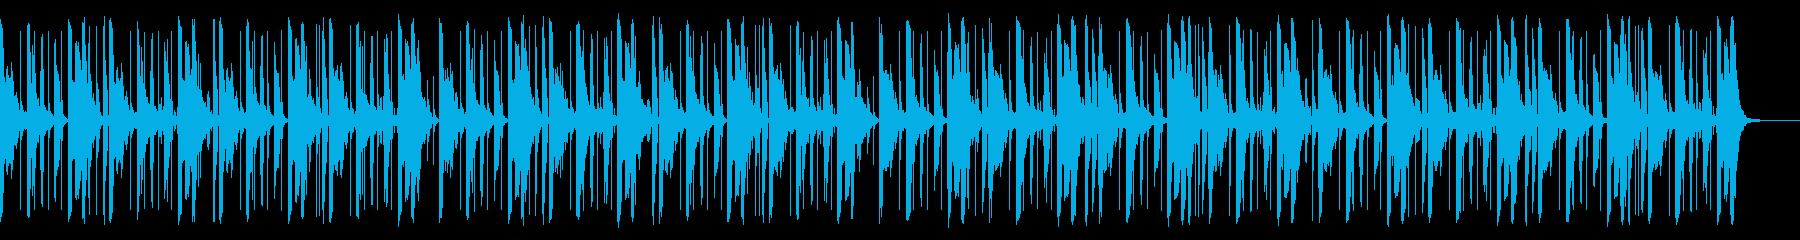 118 BPMの再生済みの波形